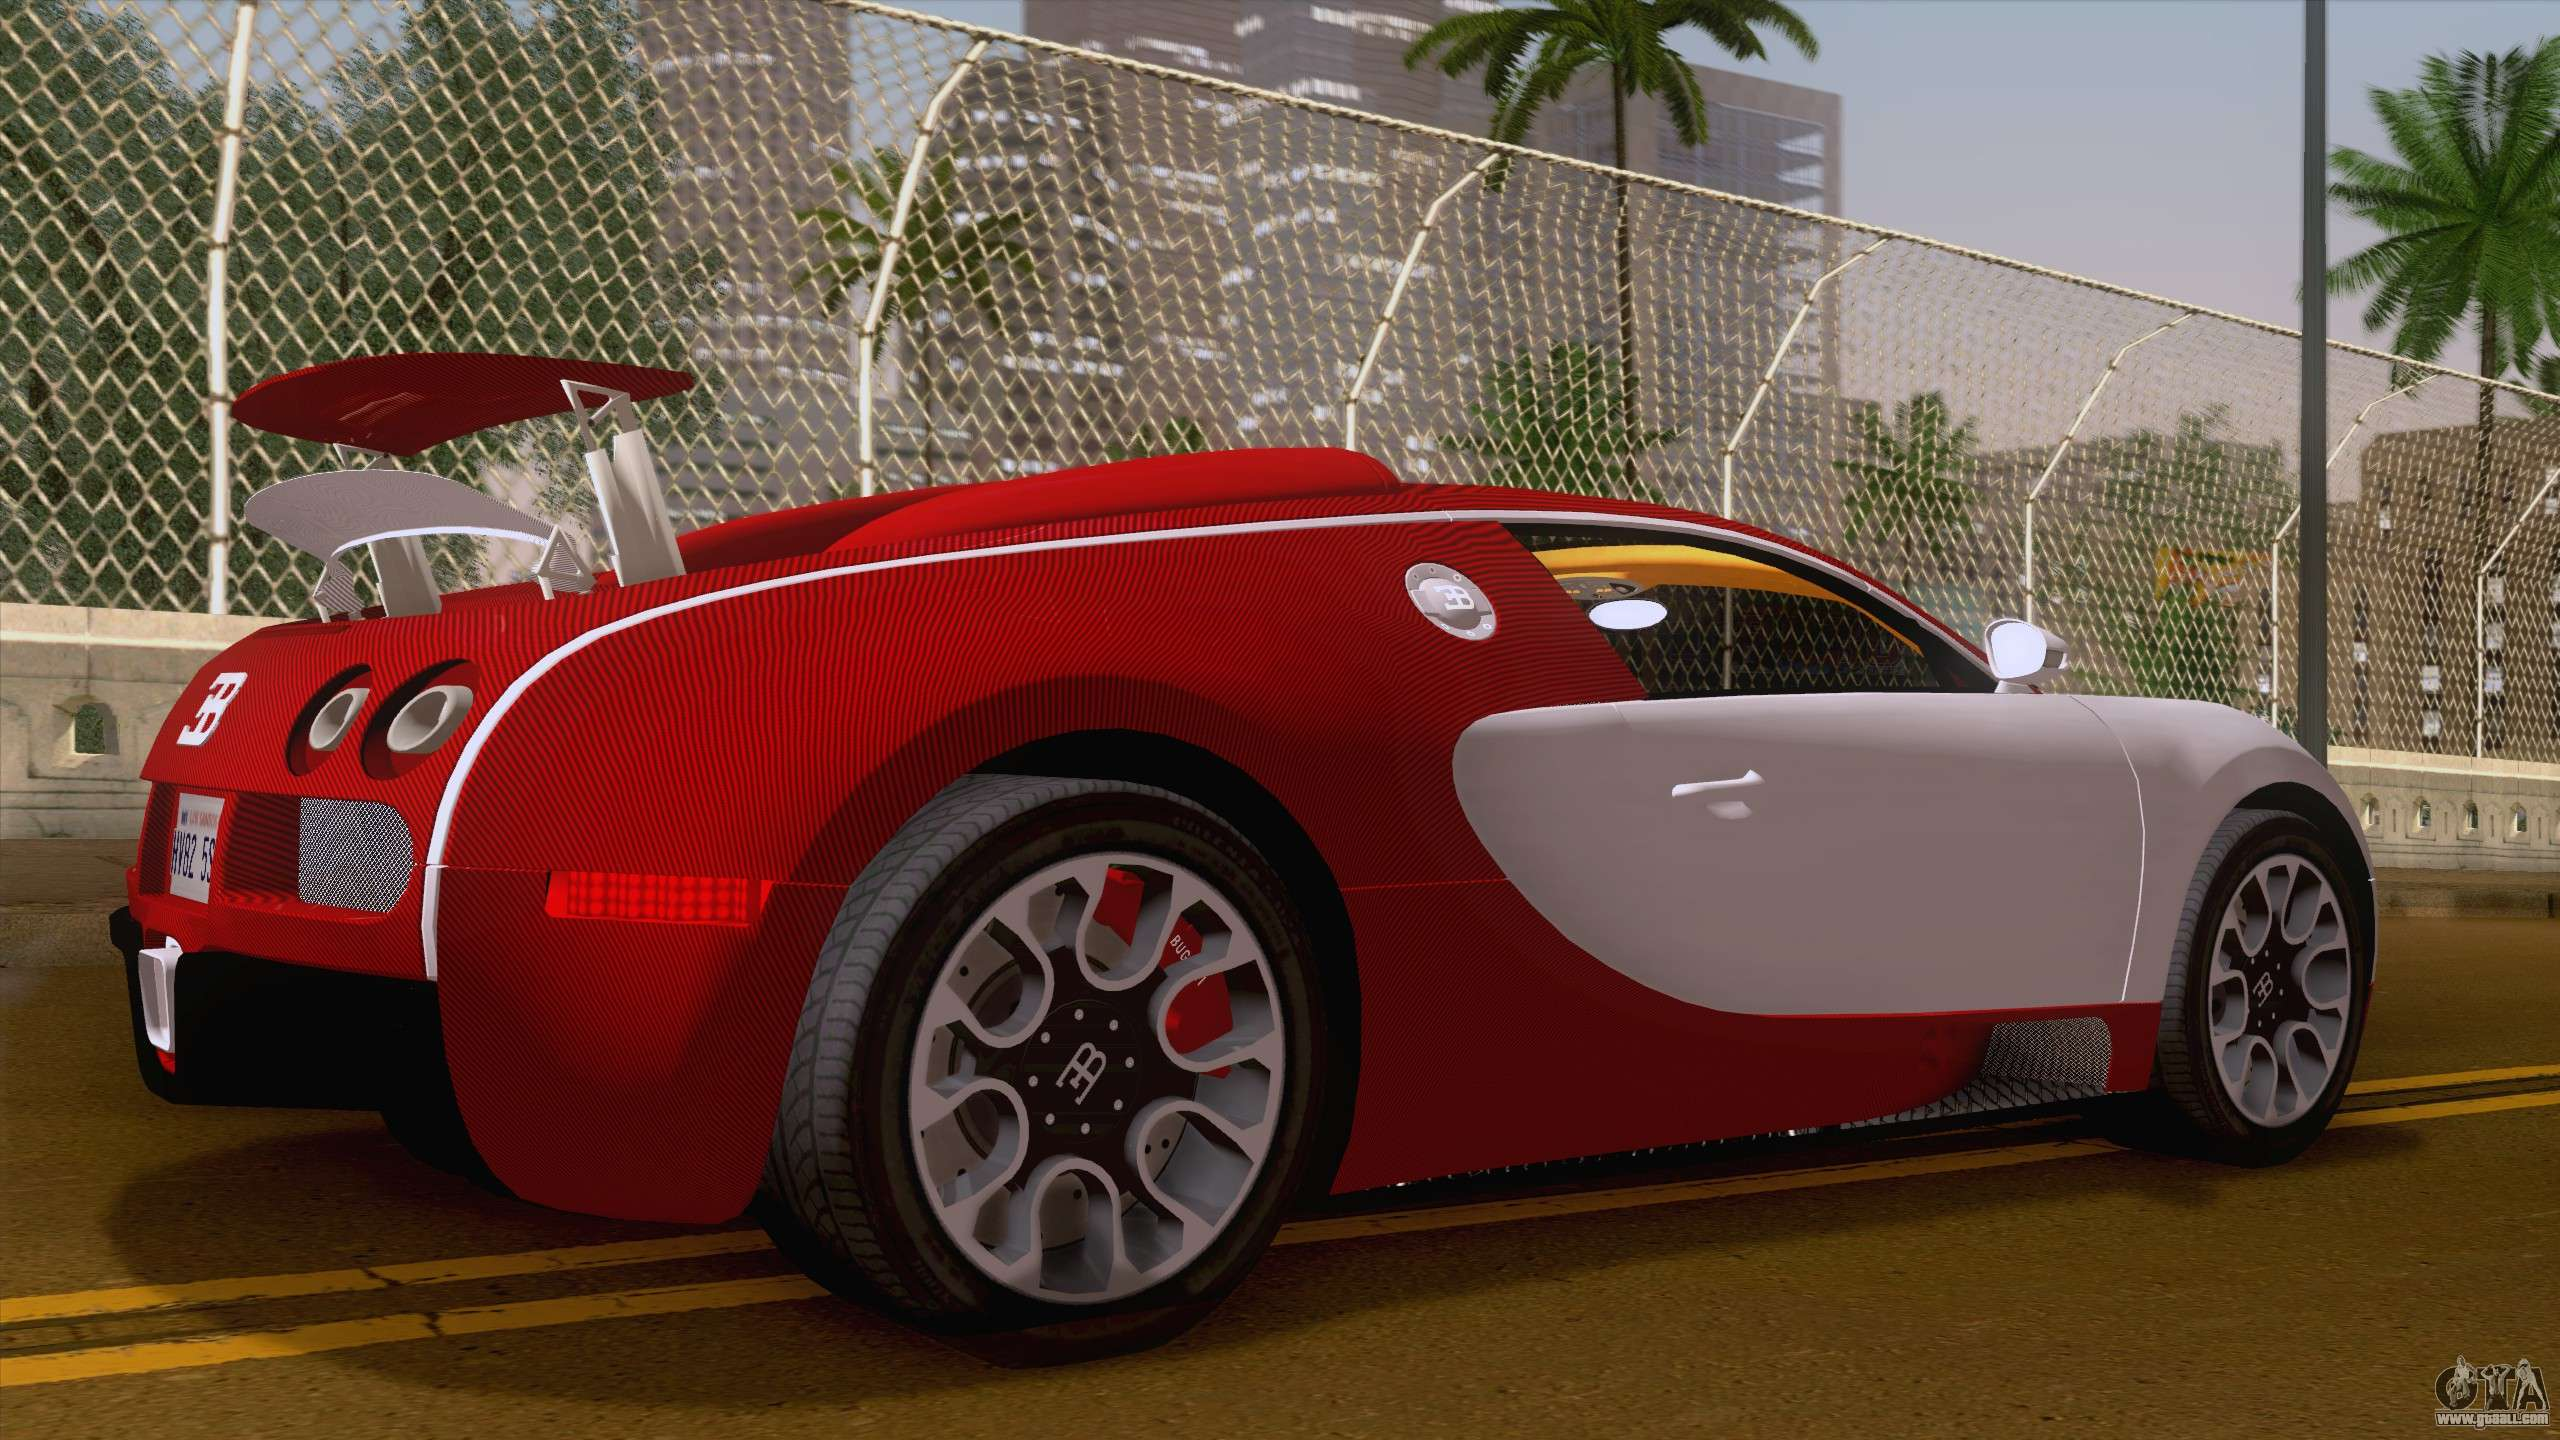 243782-gta-sa-2015-01-14-00-14-54-23 Wonderful Bugatti Veyron Xbox 360 Games Cars Trend